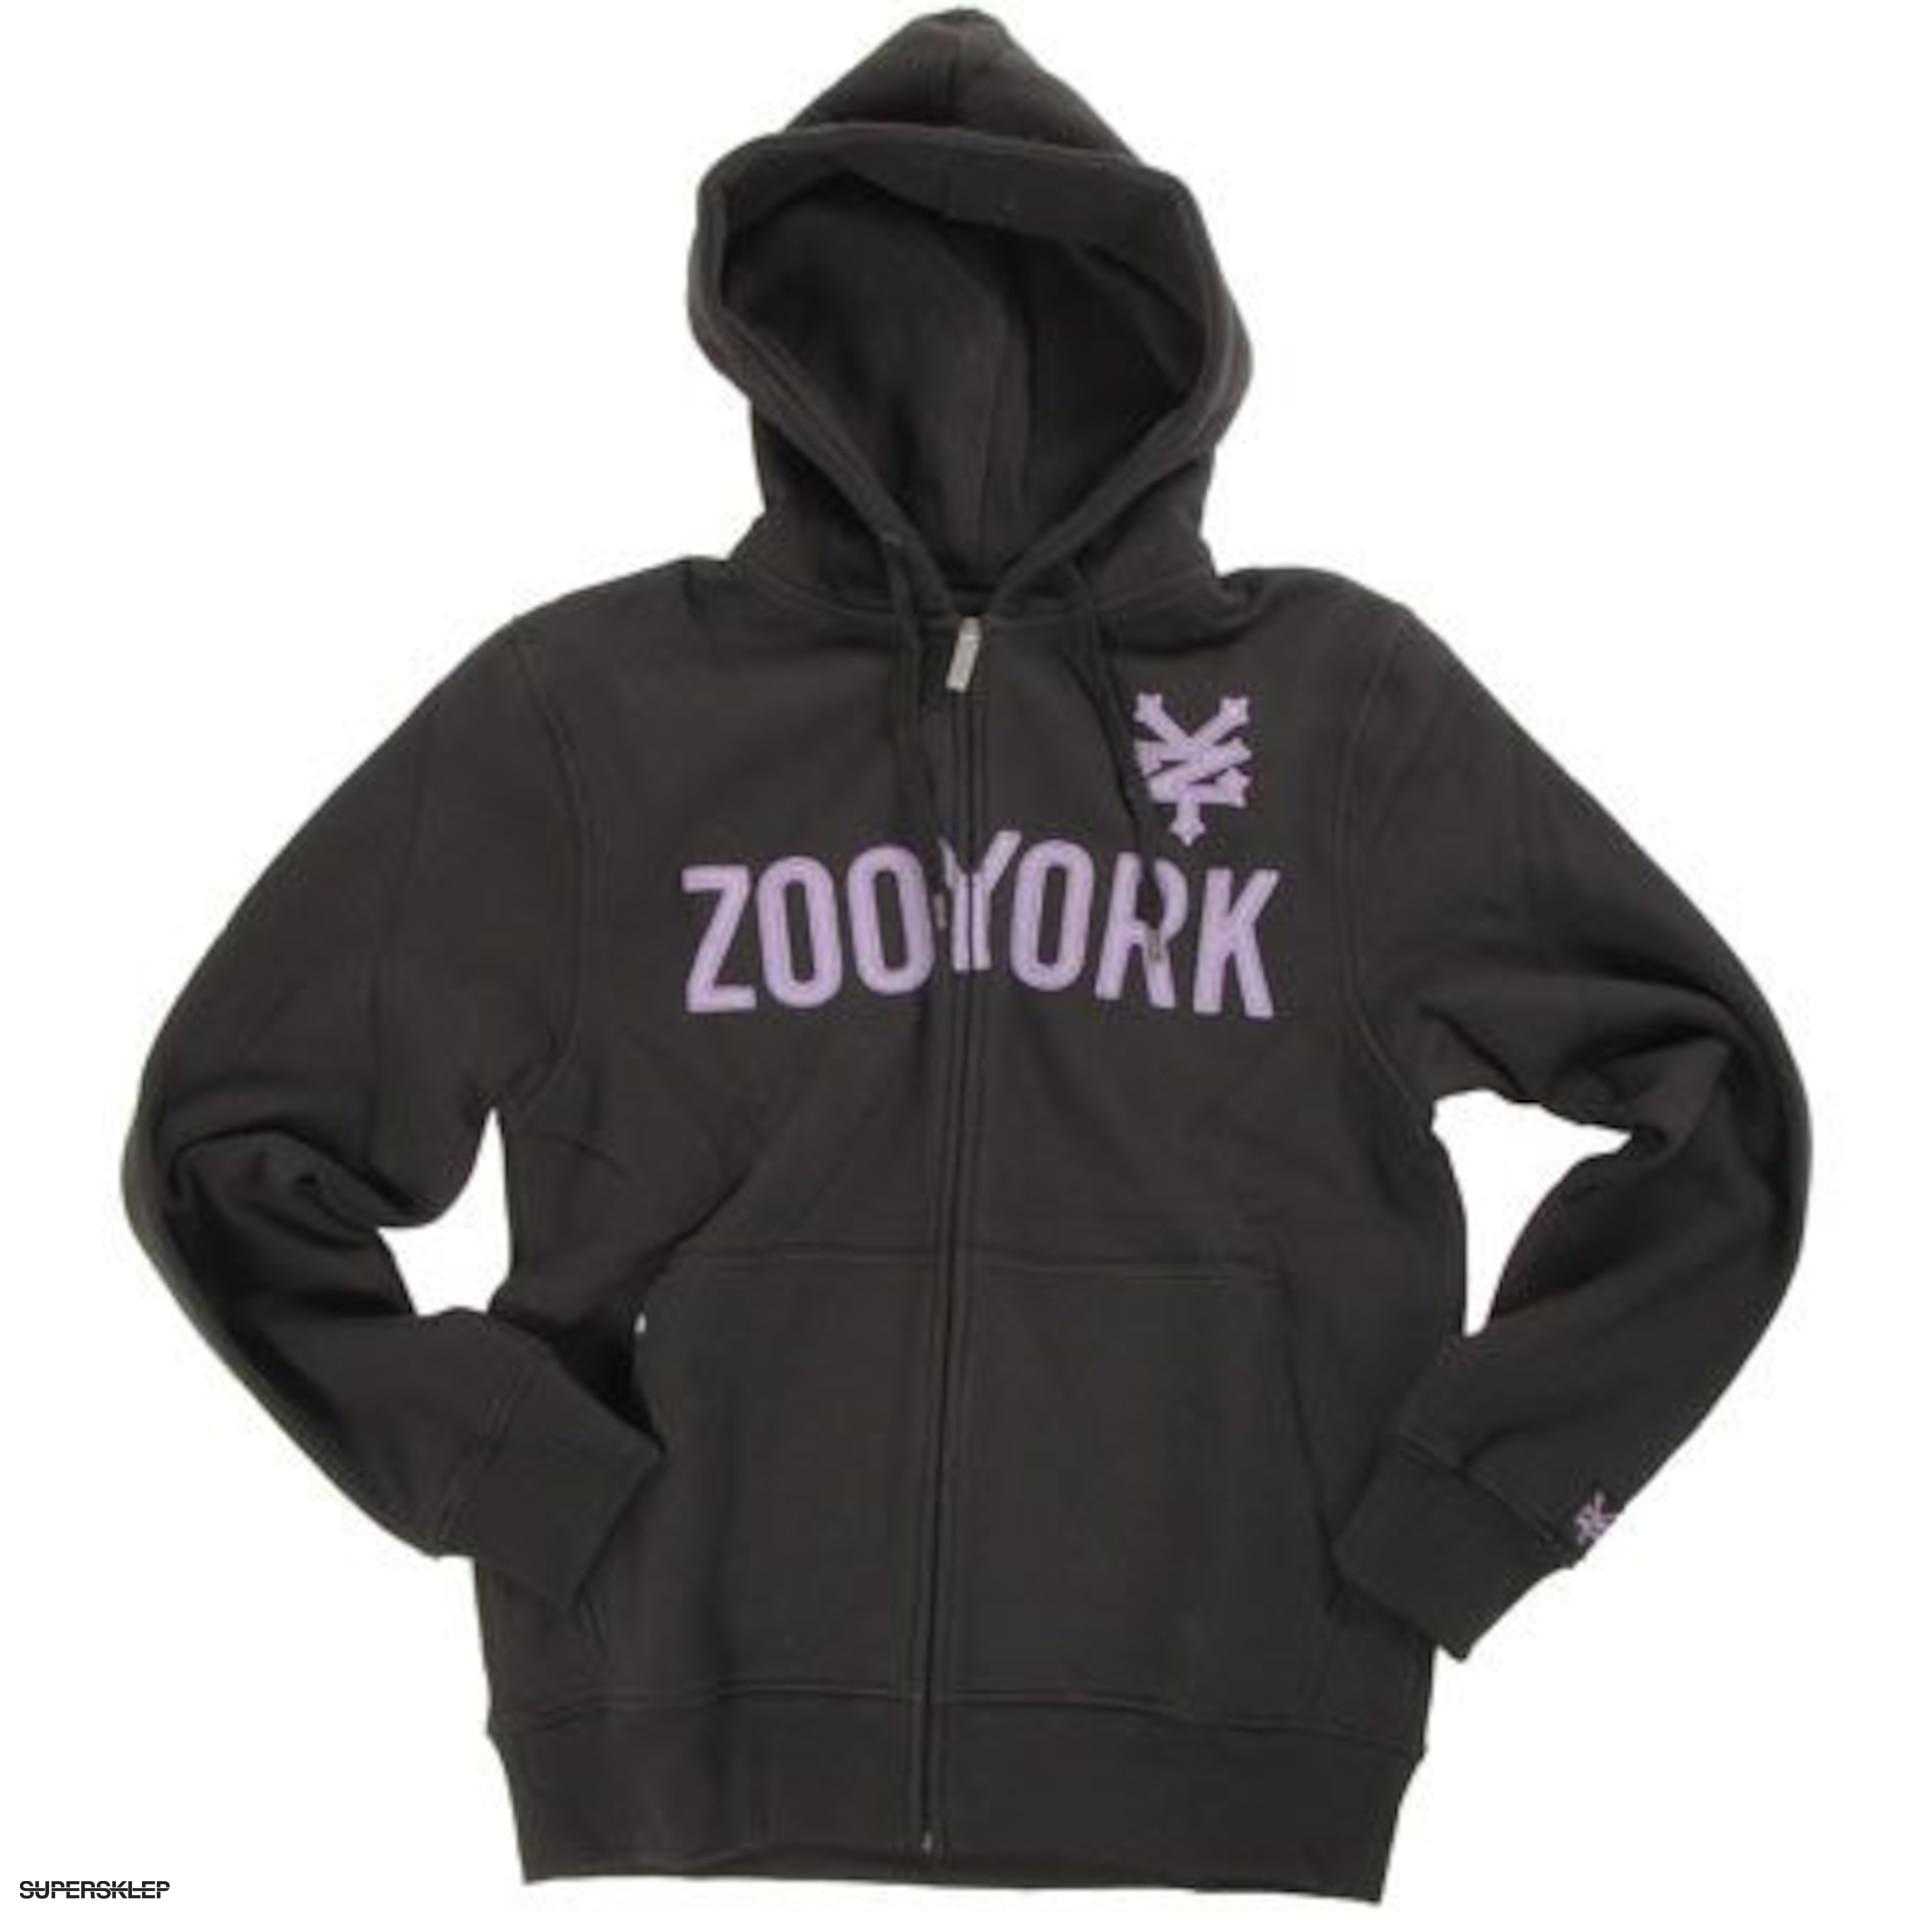 adidas bluza z kapturem zoo